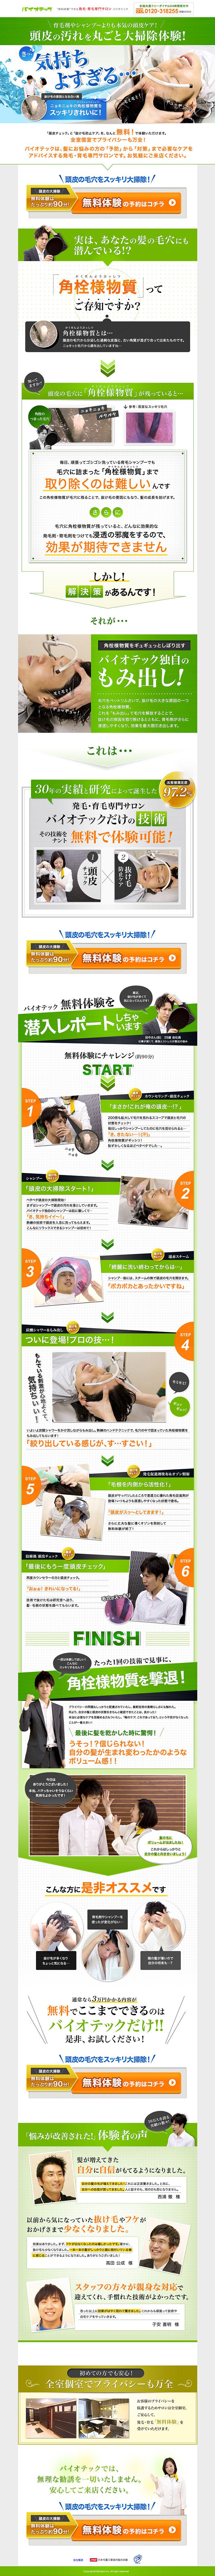 33-www-biotech-ne-jp-lp-kakusen-google-1460820226578